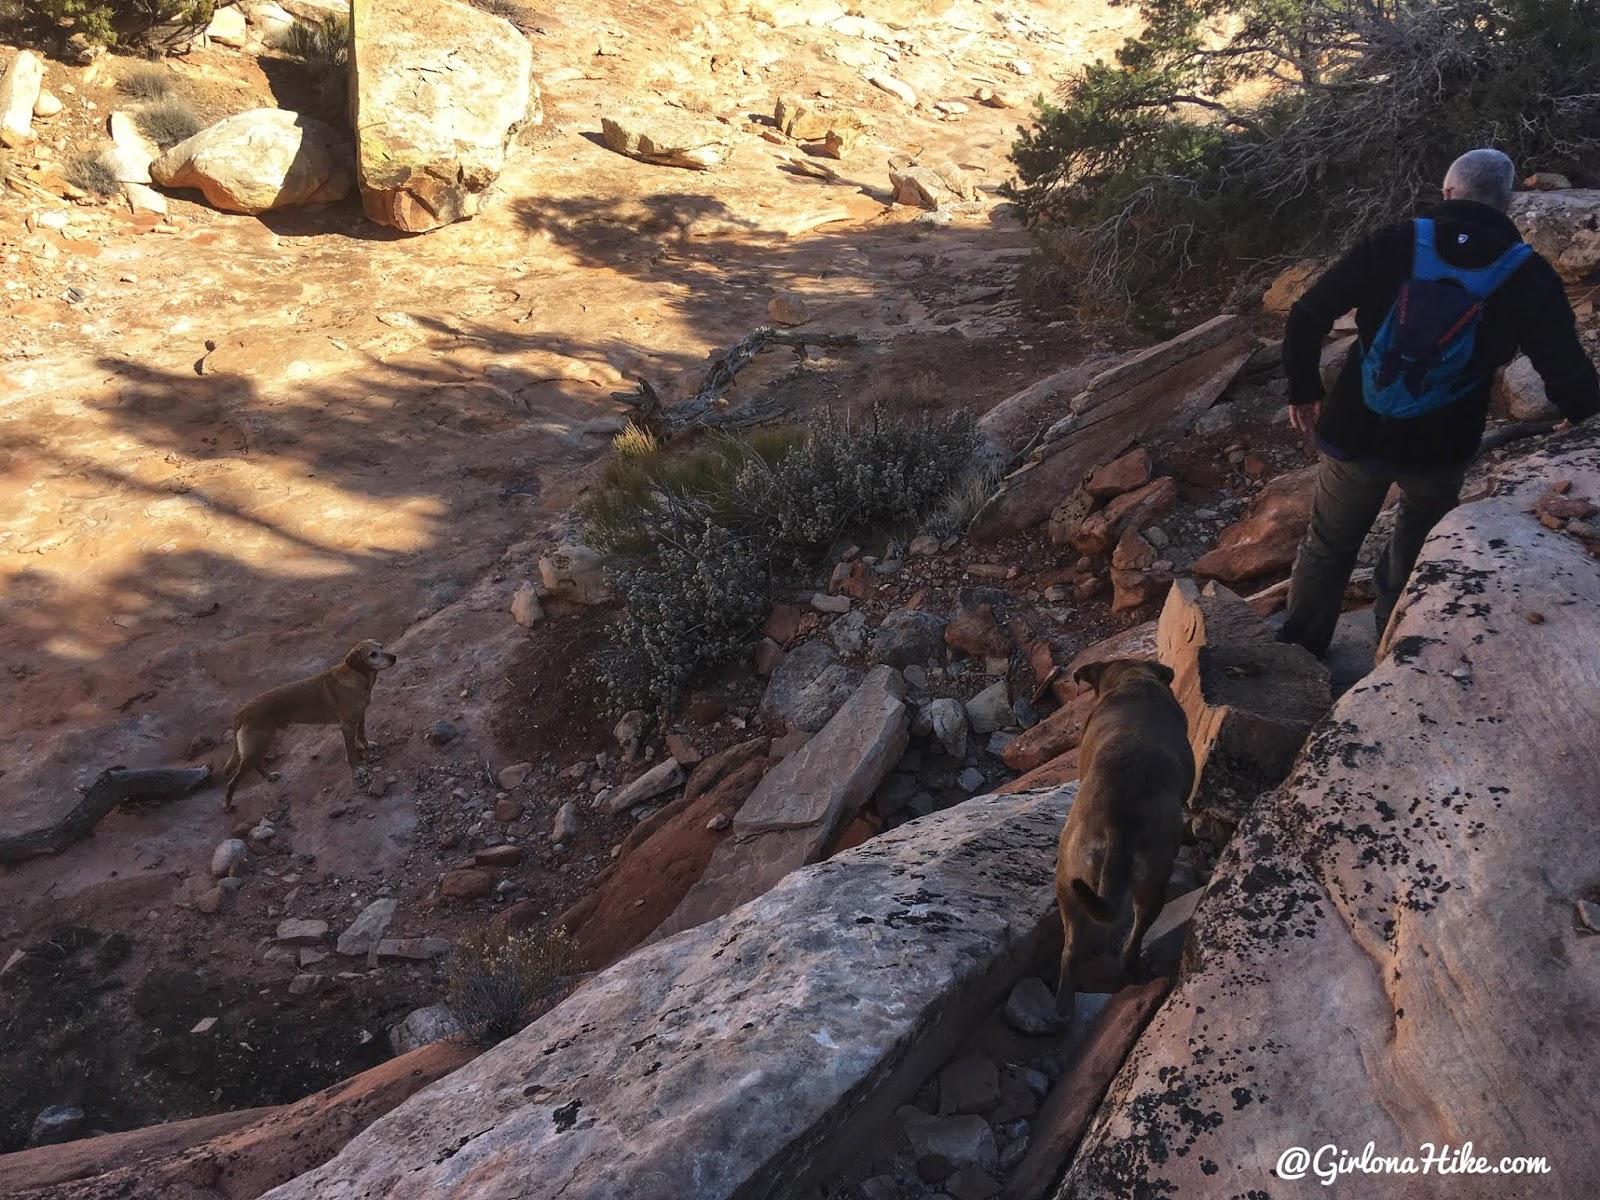 Hiking to the Seven Kivas Ruin via Shortcut Route